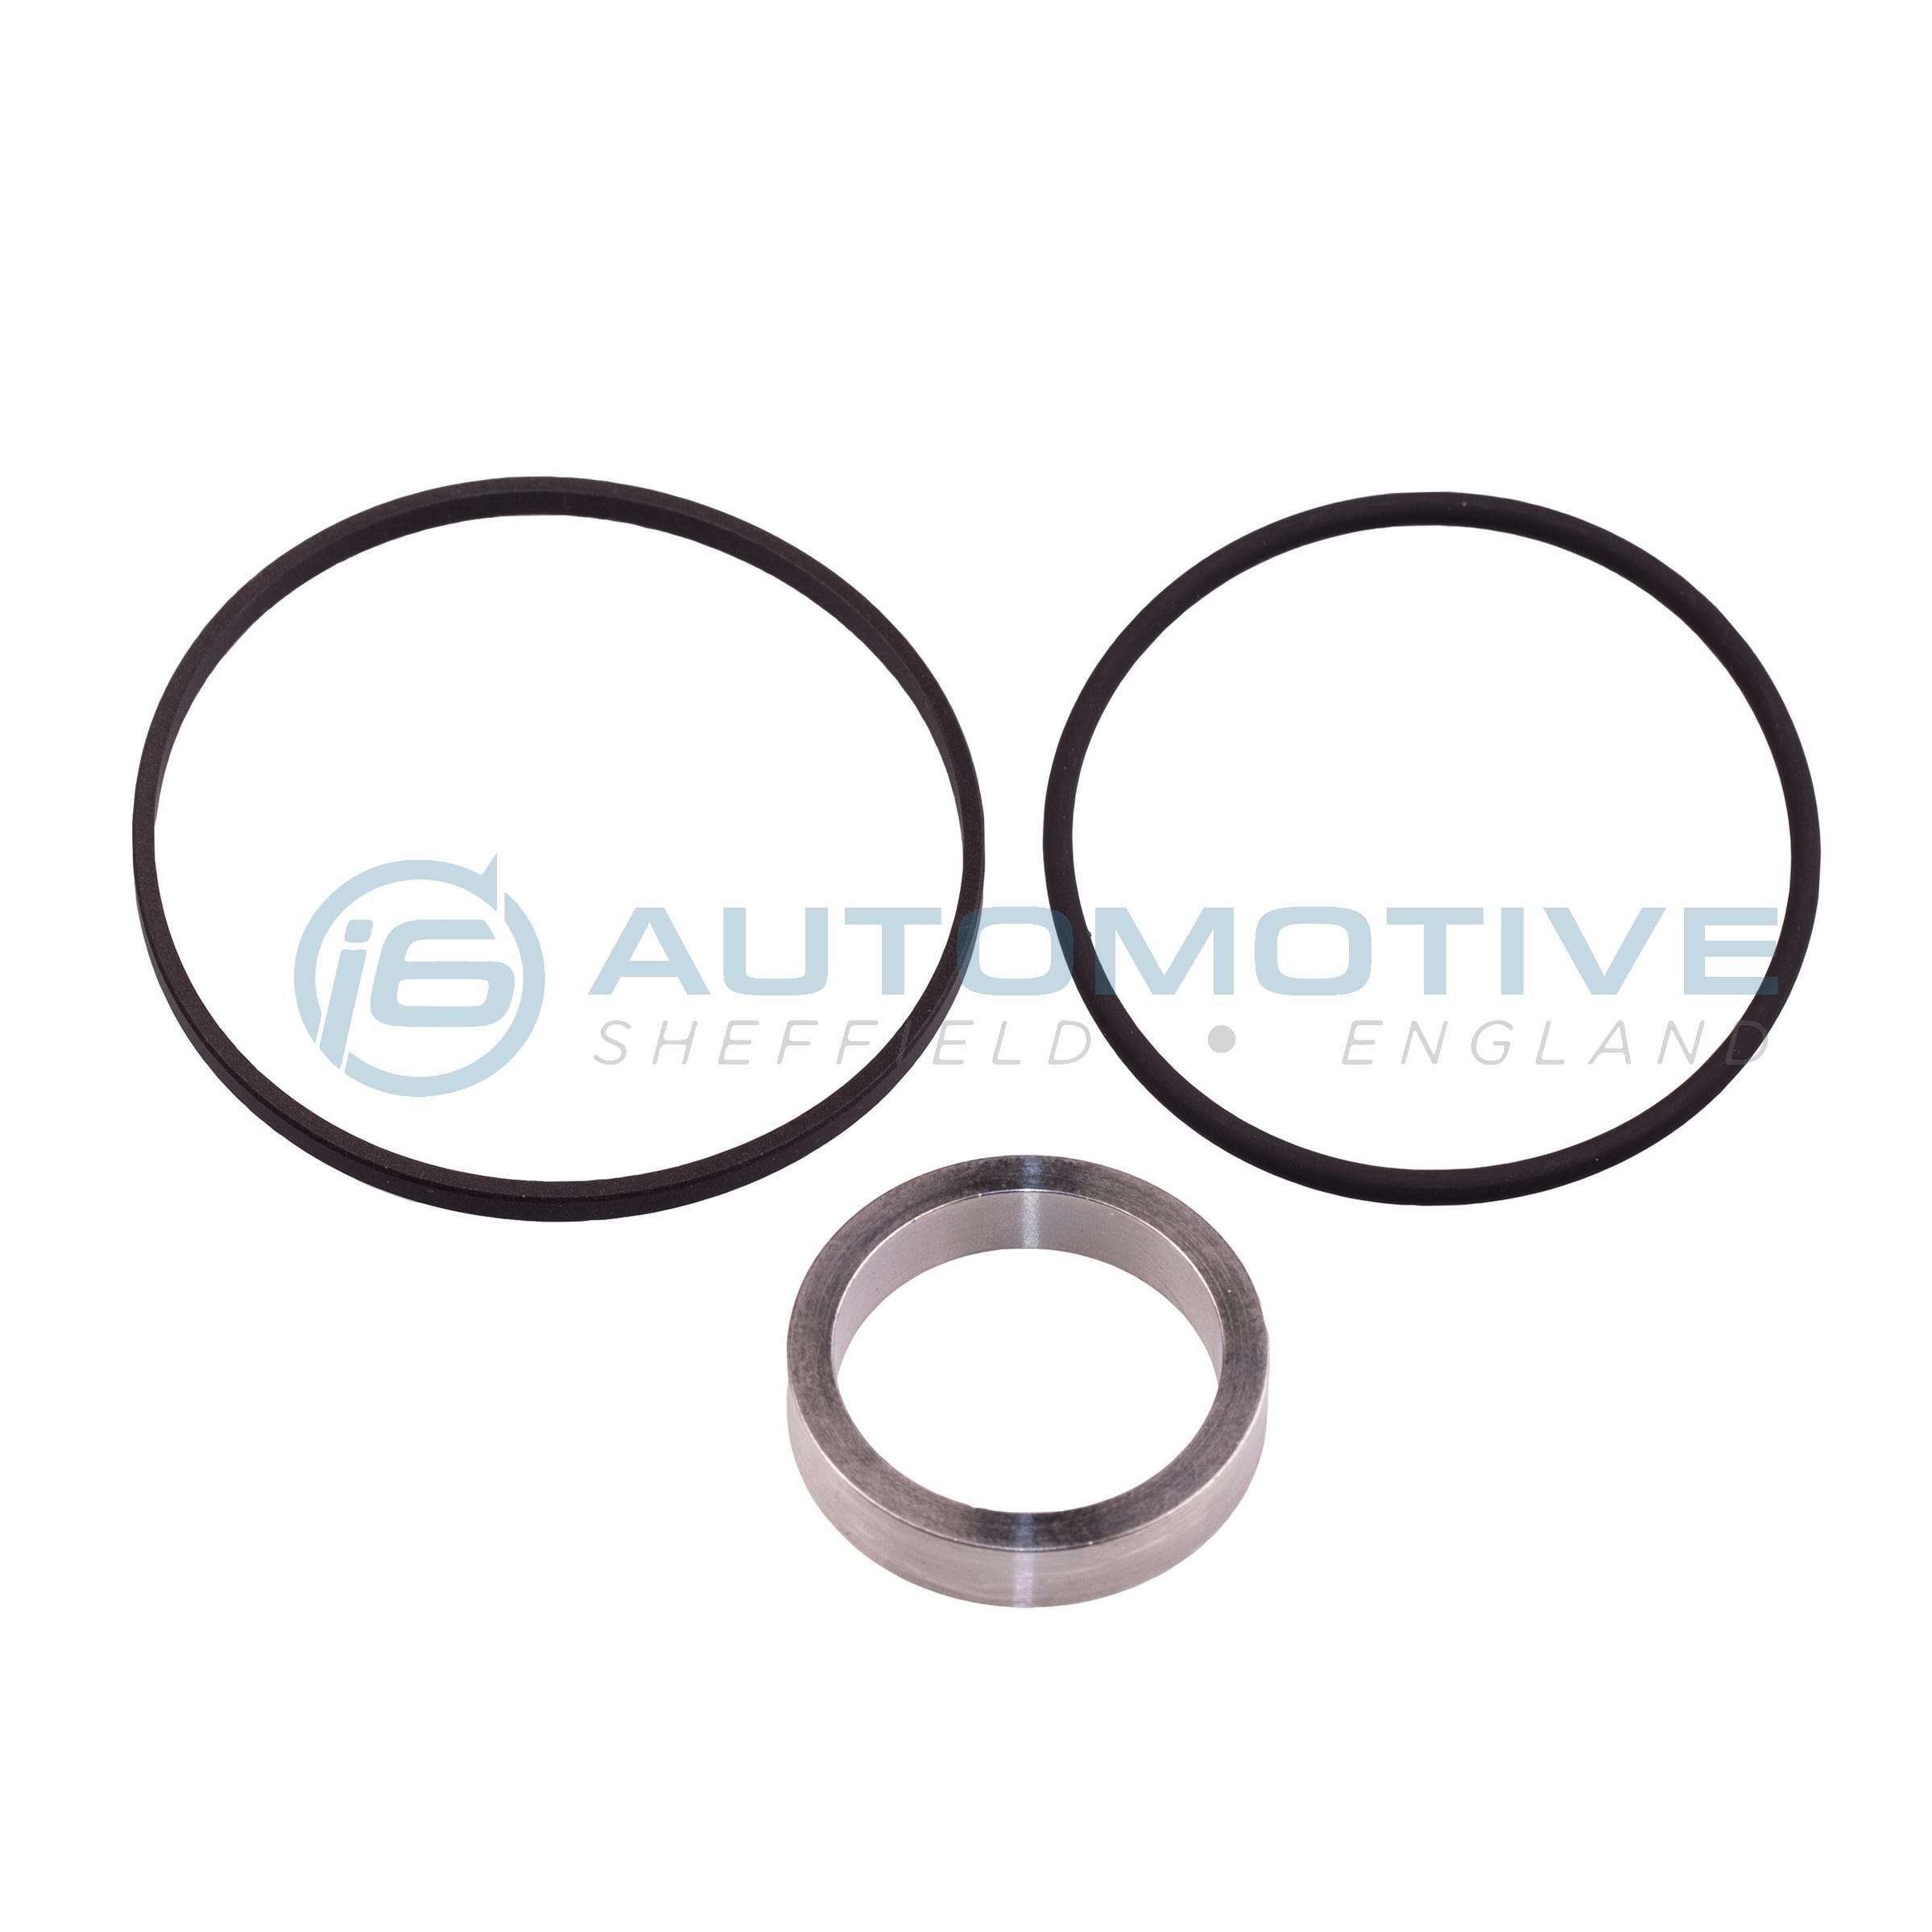 Bmw Z3 Window Seals: BMW Single Vanos Seal And Rattle Ring Kit BMW M52 M50 Z3